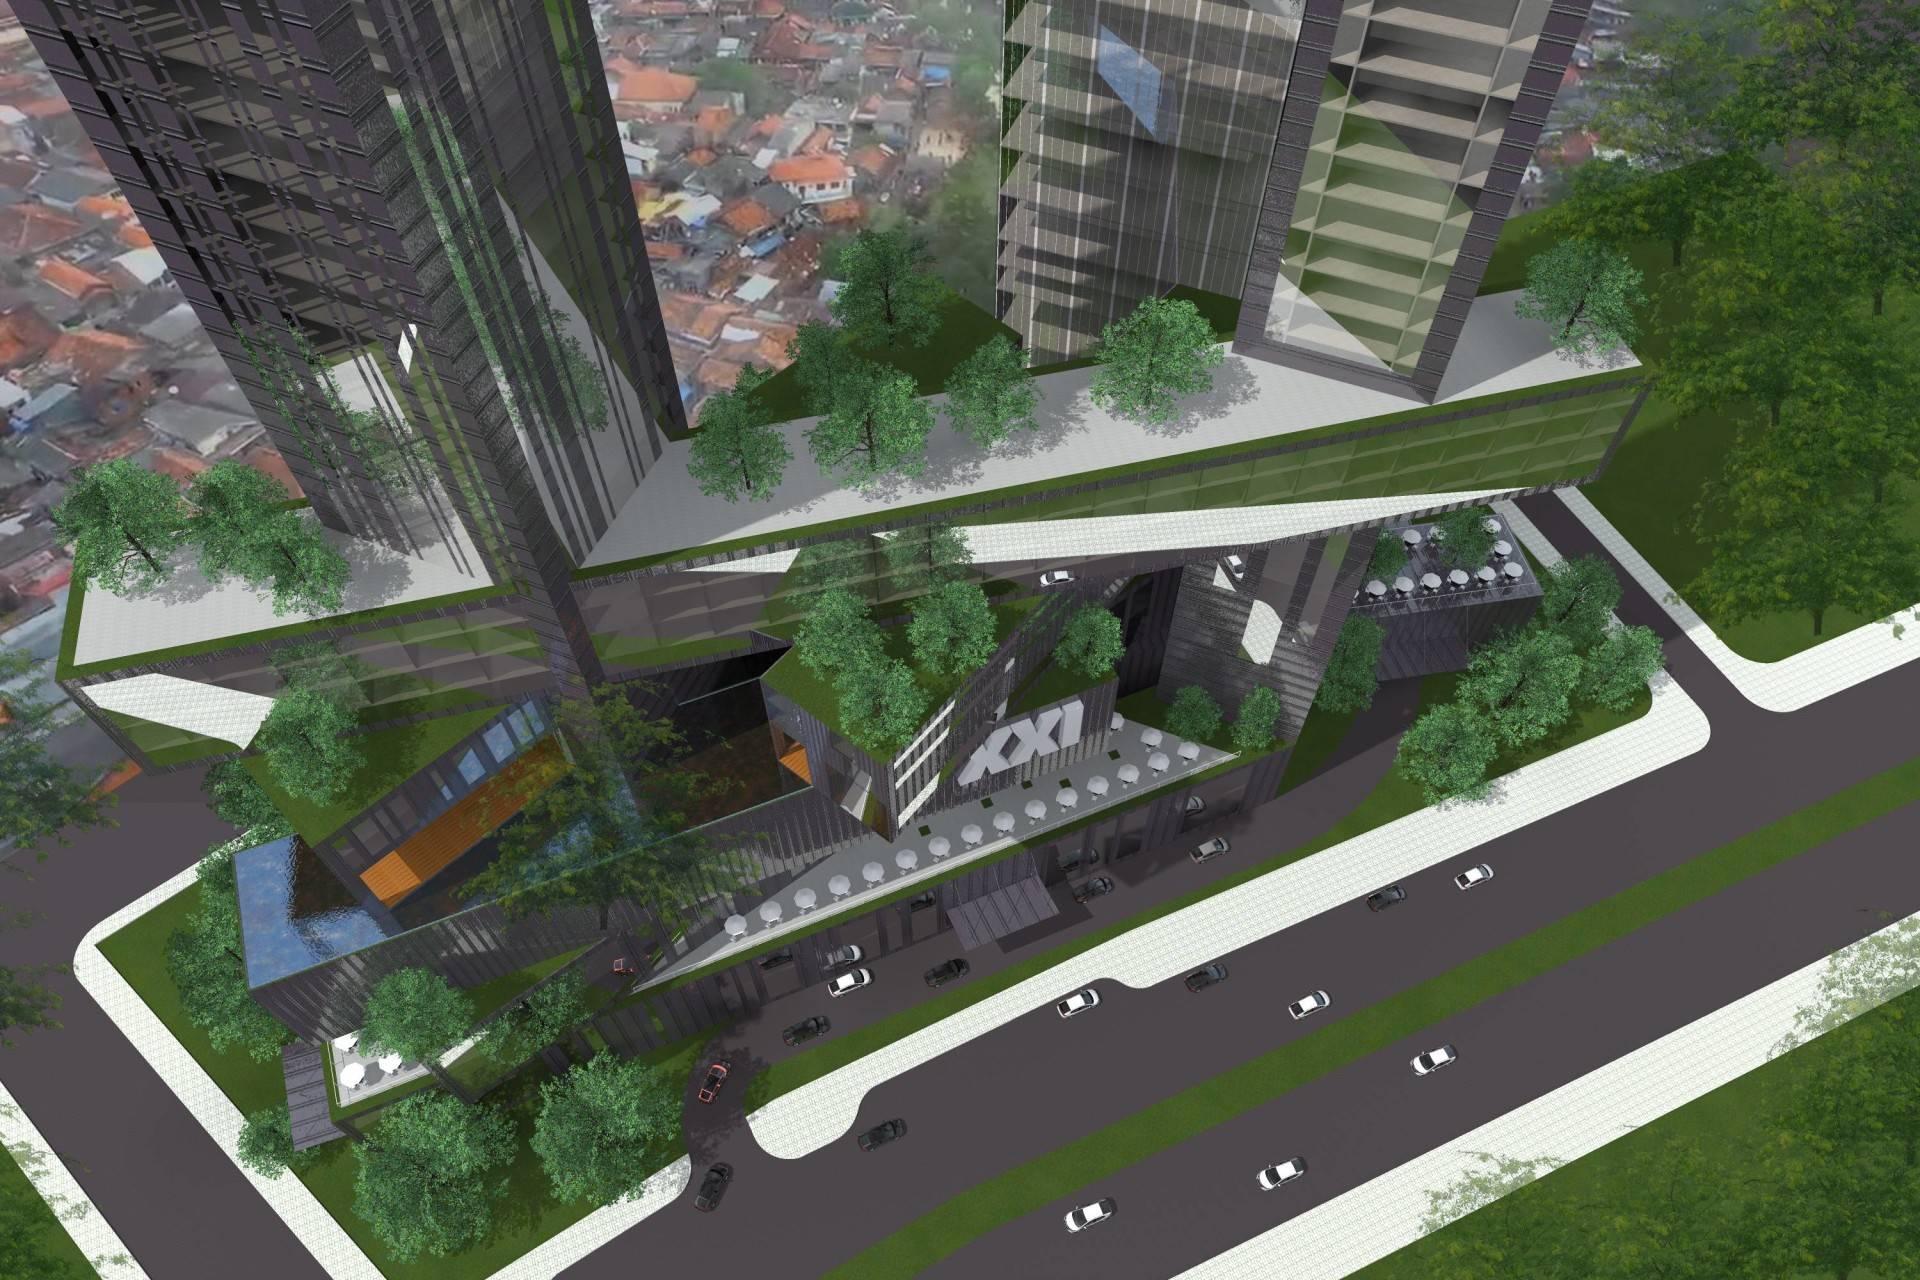 Monokroma Architect Platinum Condominium South Tangerang, Banten South Tangerang, Banten Bird Eye View Modern  6837